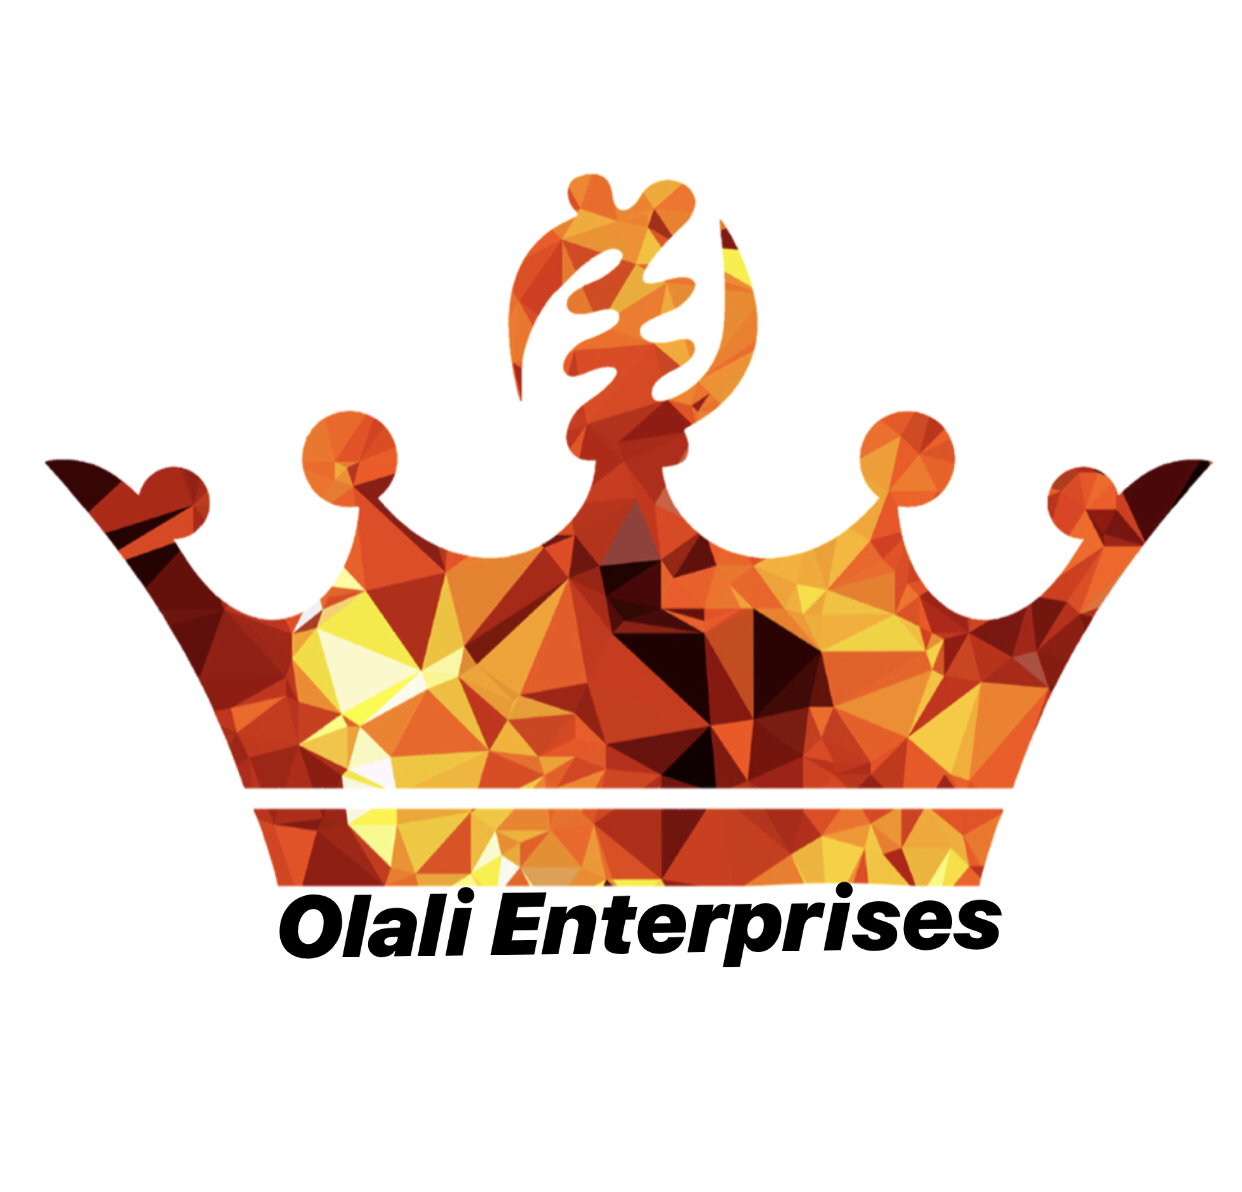 Olali Enterprises image